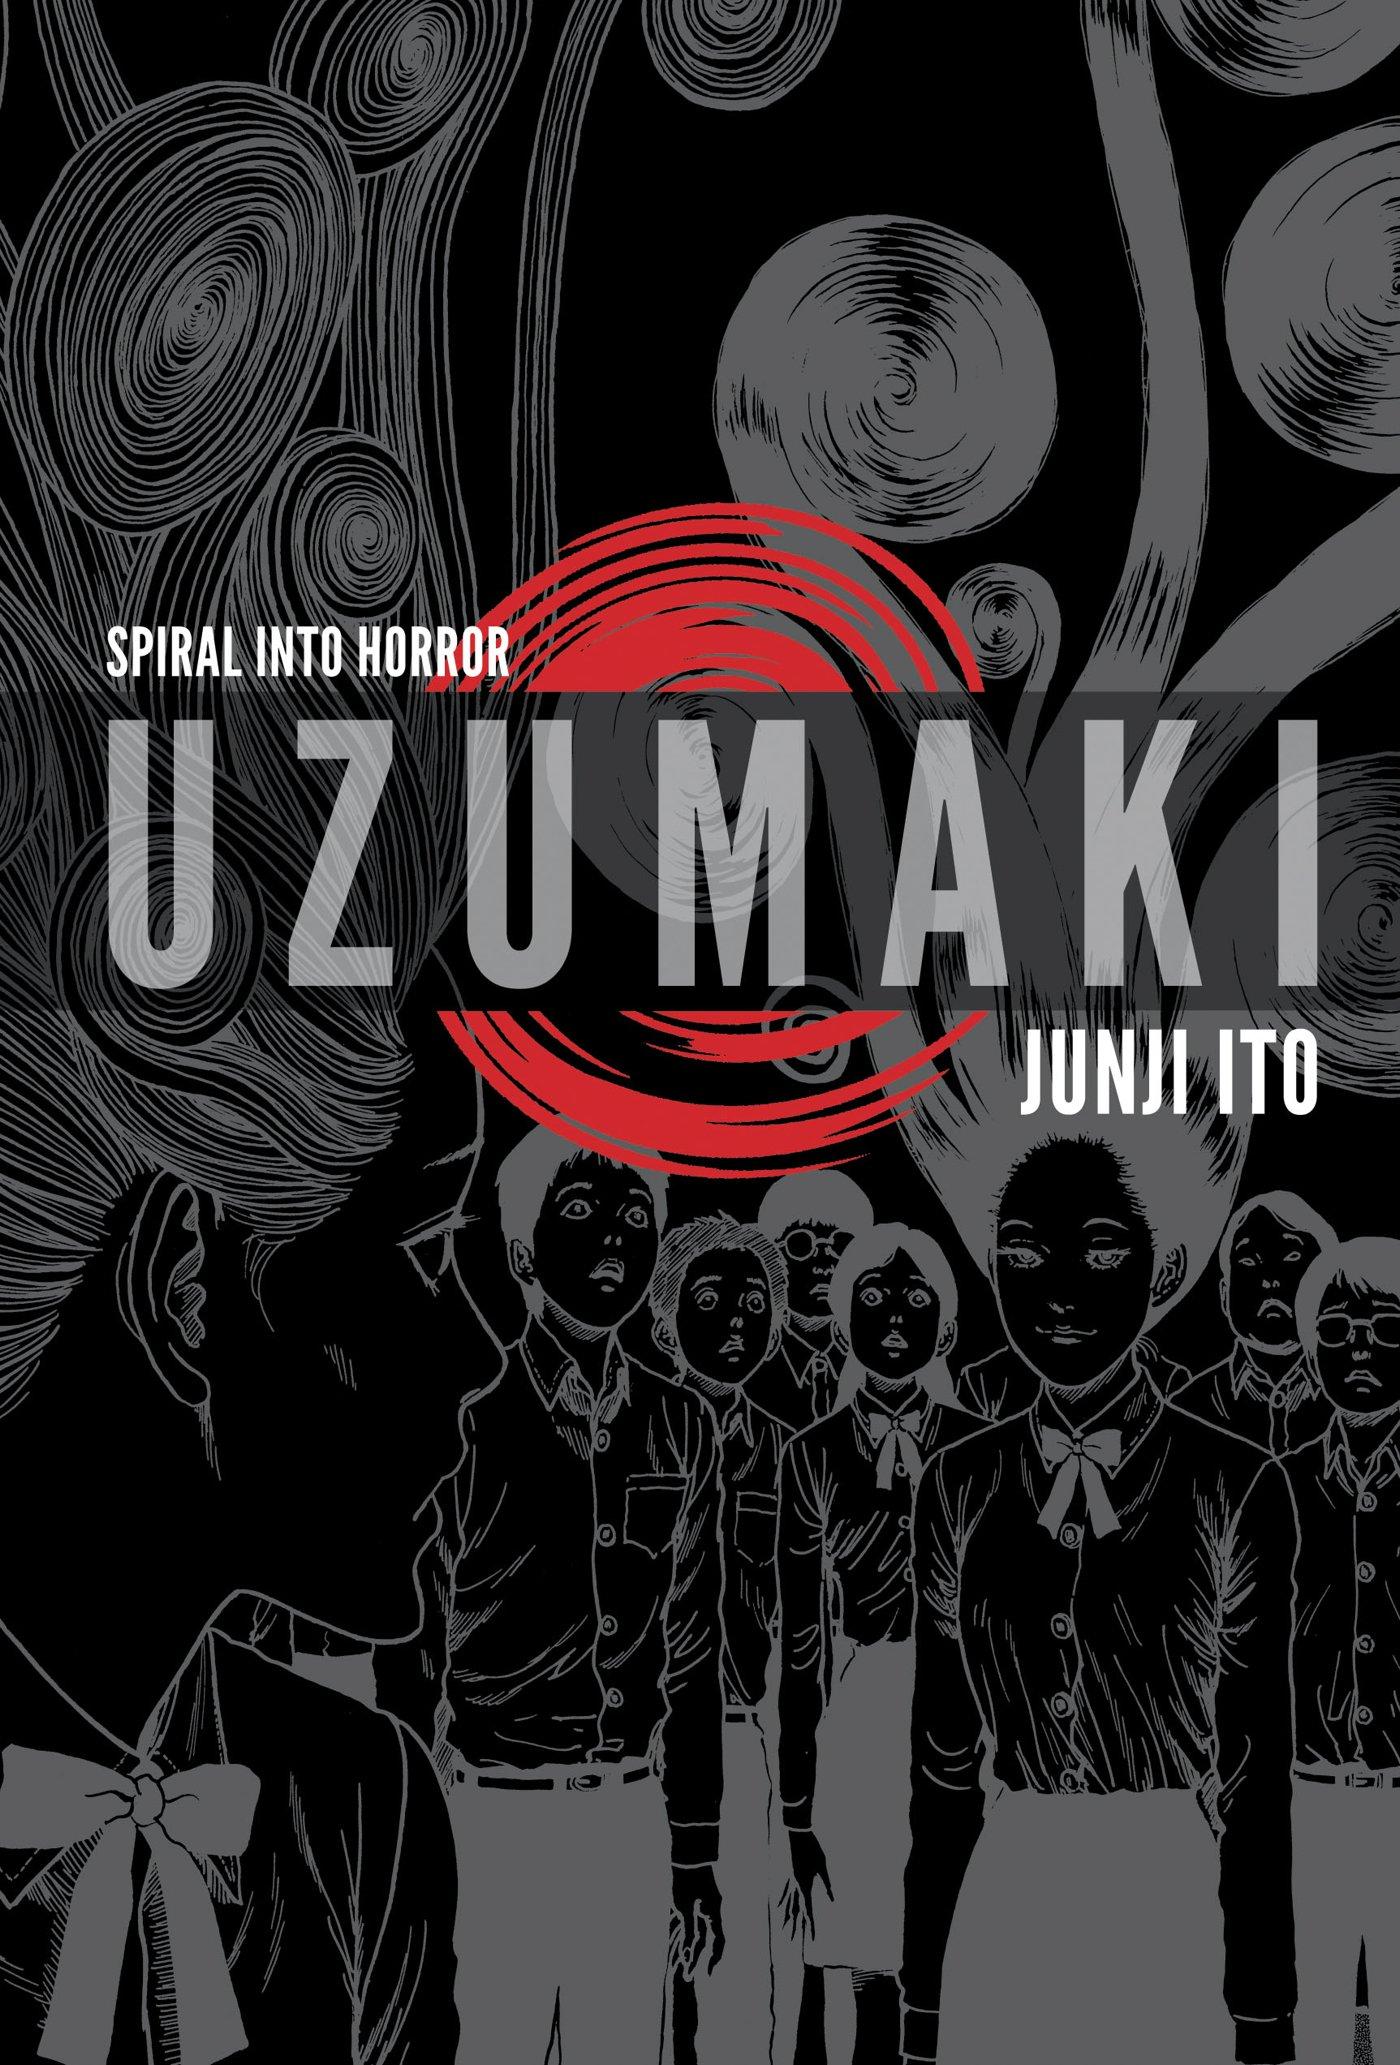 10. Uzumaki (autor: Junji Ito)